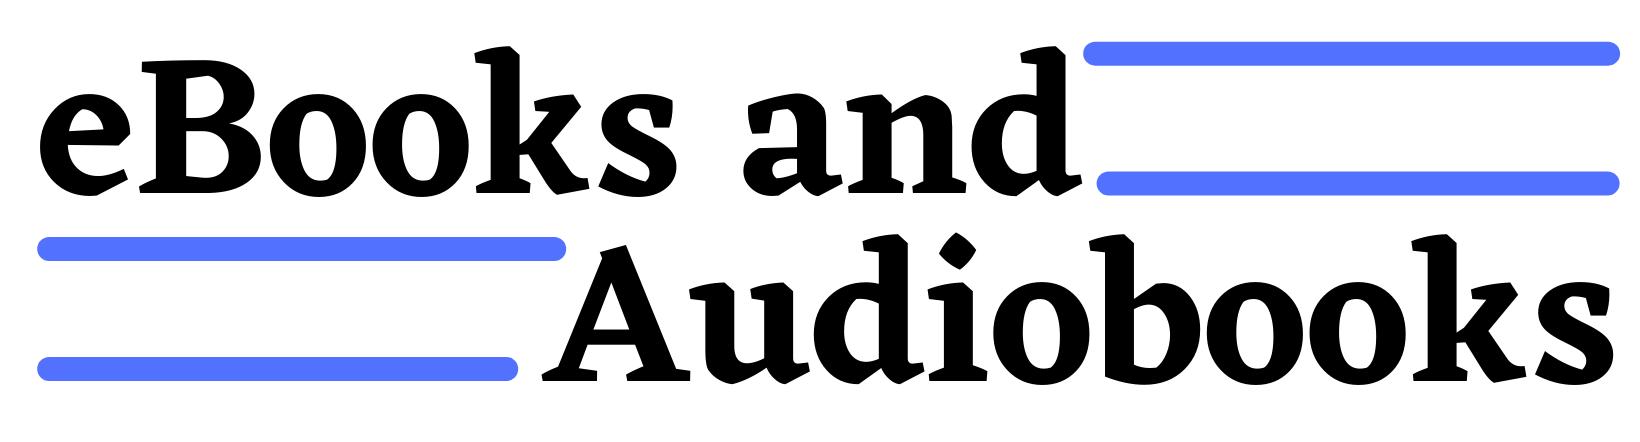 ebooks and audiobooks banner